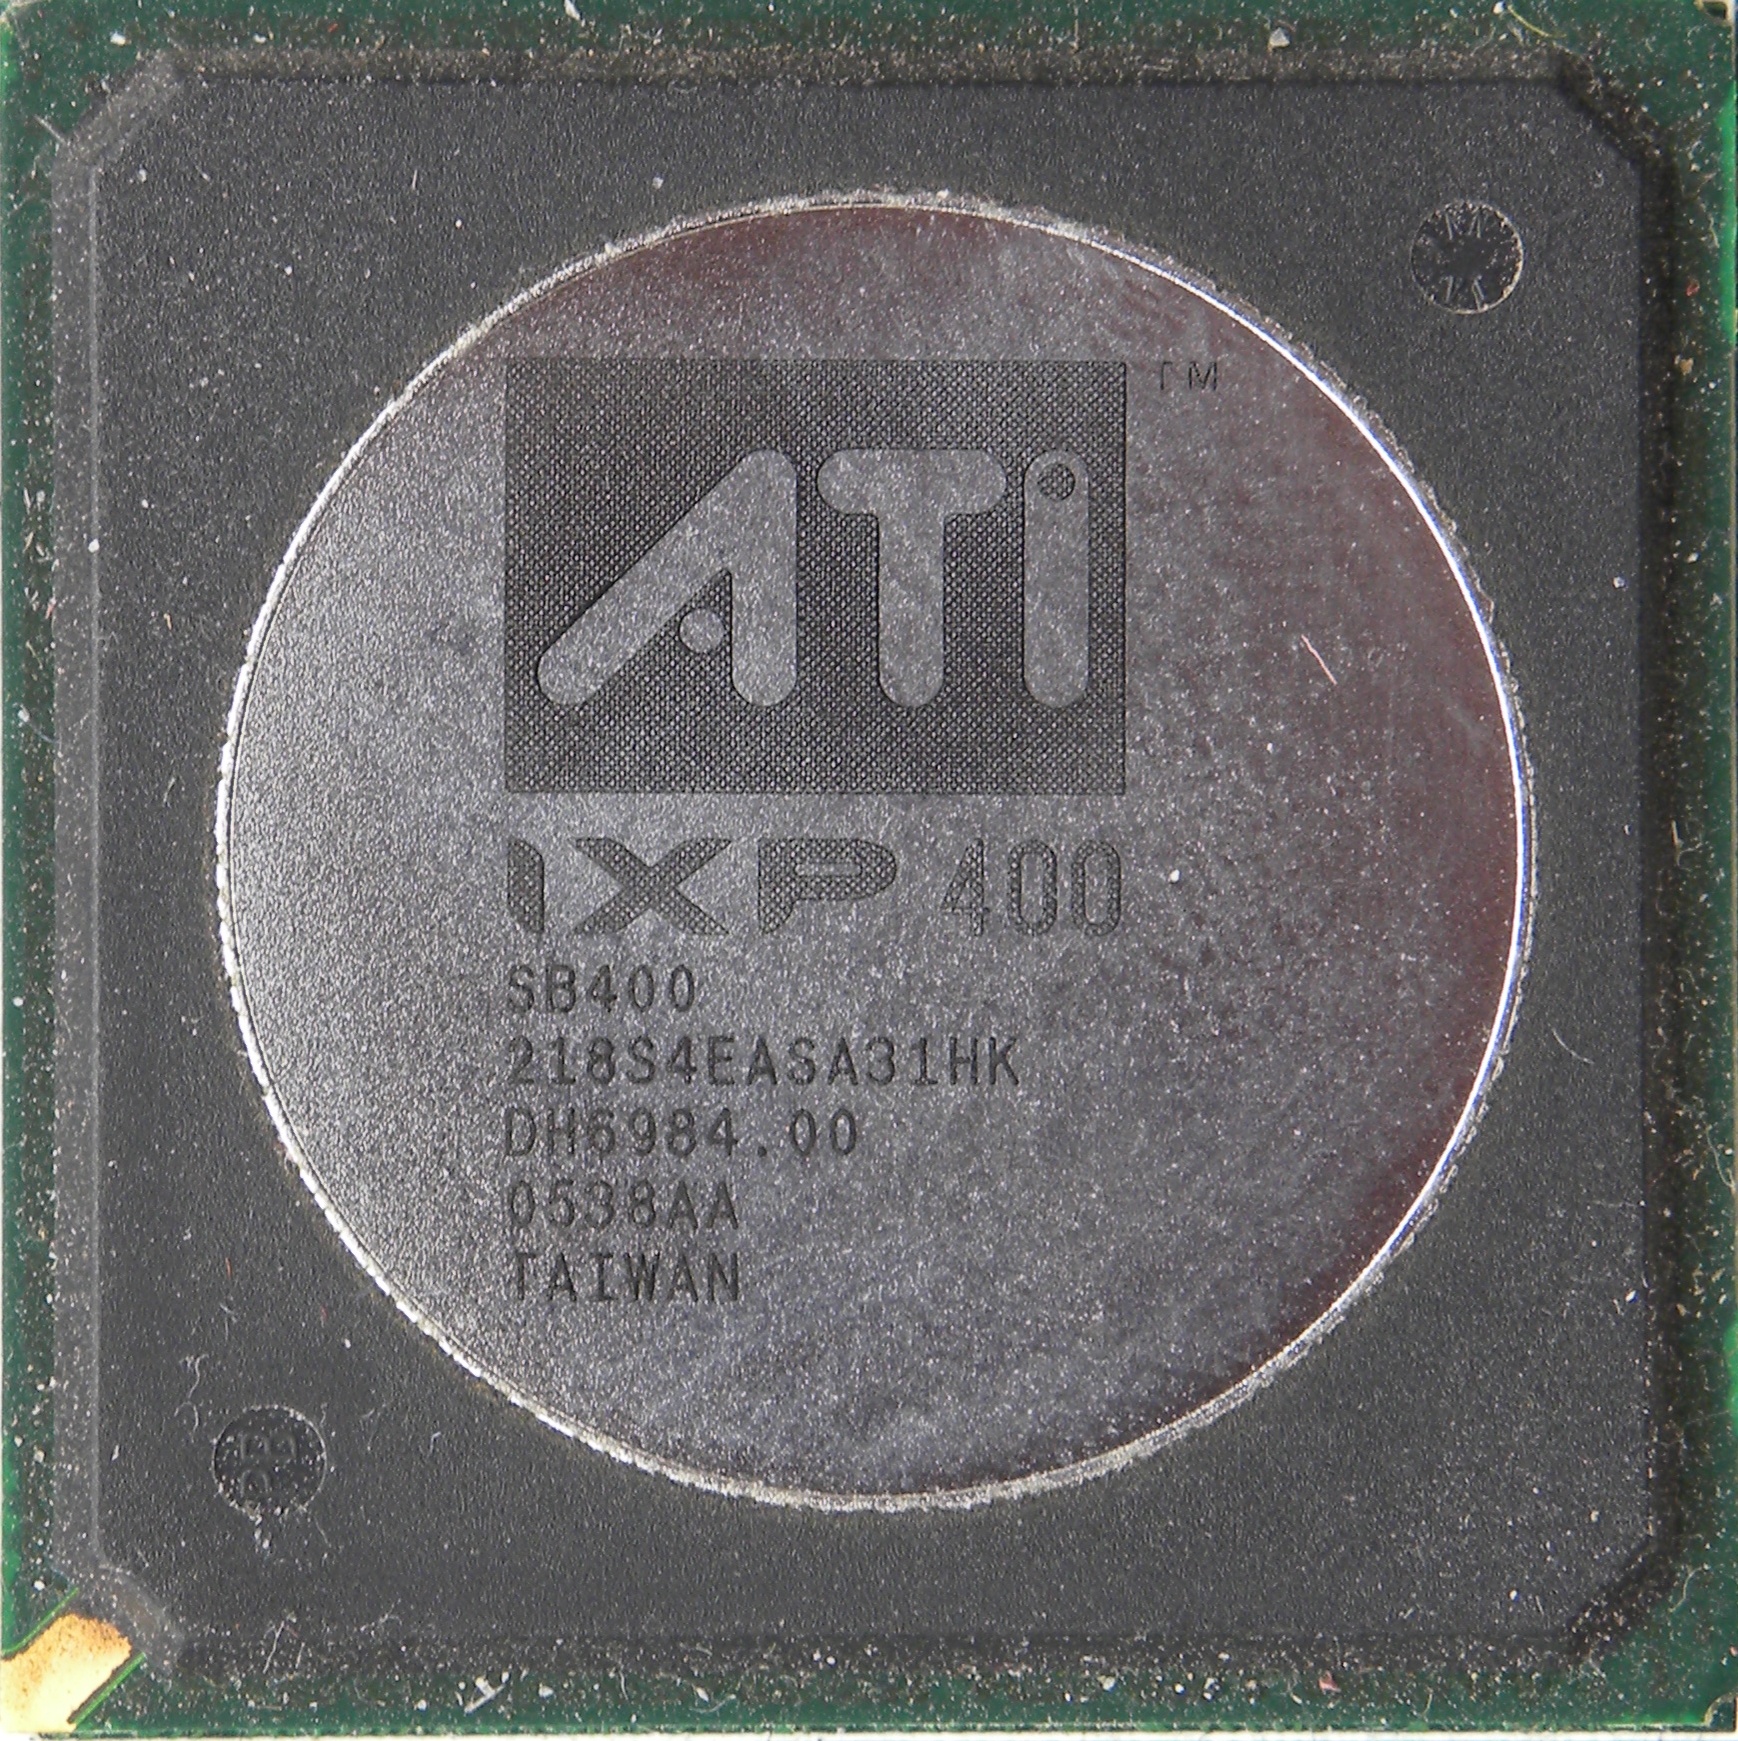 INC RADEON ATI XPRESS 200M TÉLÉCHARGER RC410 TECHNOLOGIES